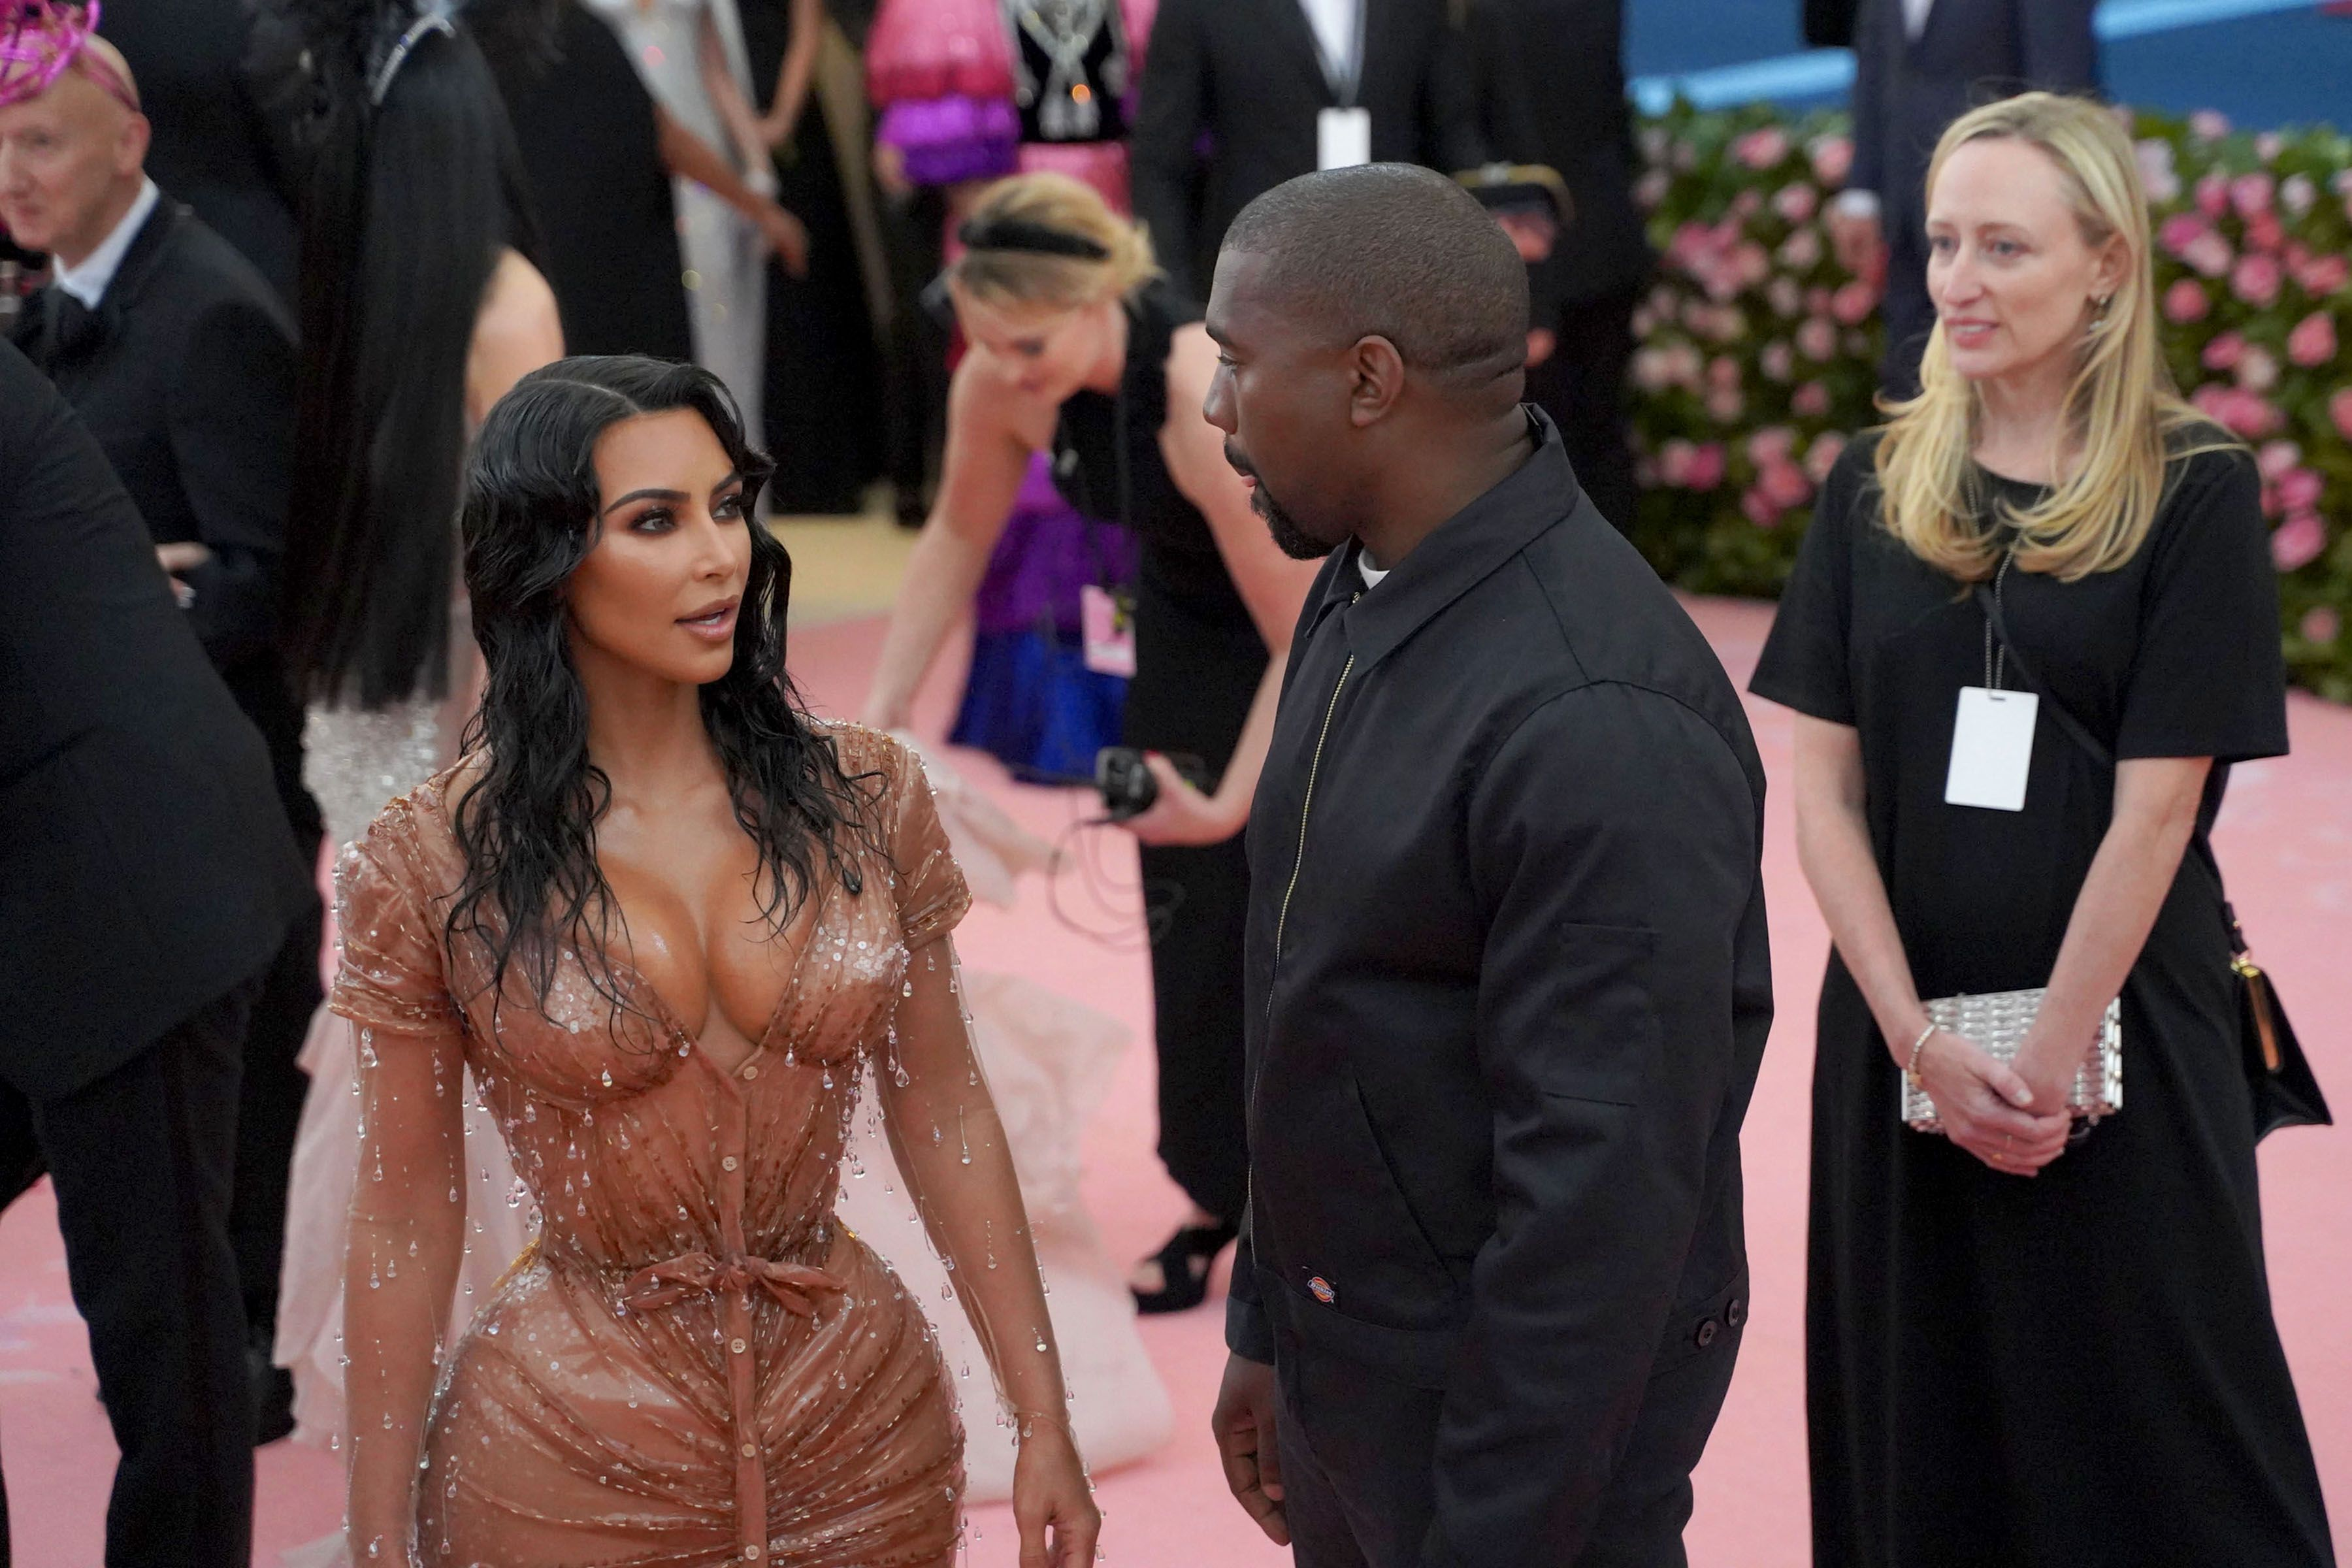 Kanye West Told Kim Kardashian Her Met Gala Corset Was 'Too Sexy'